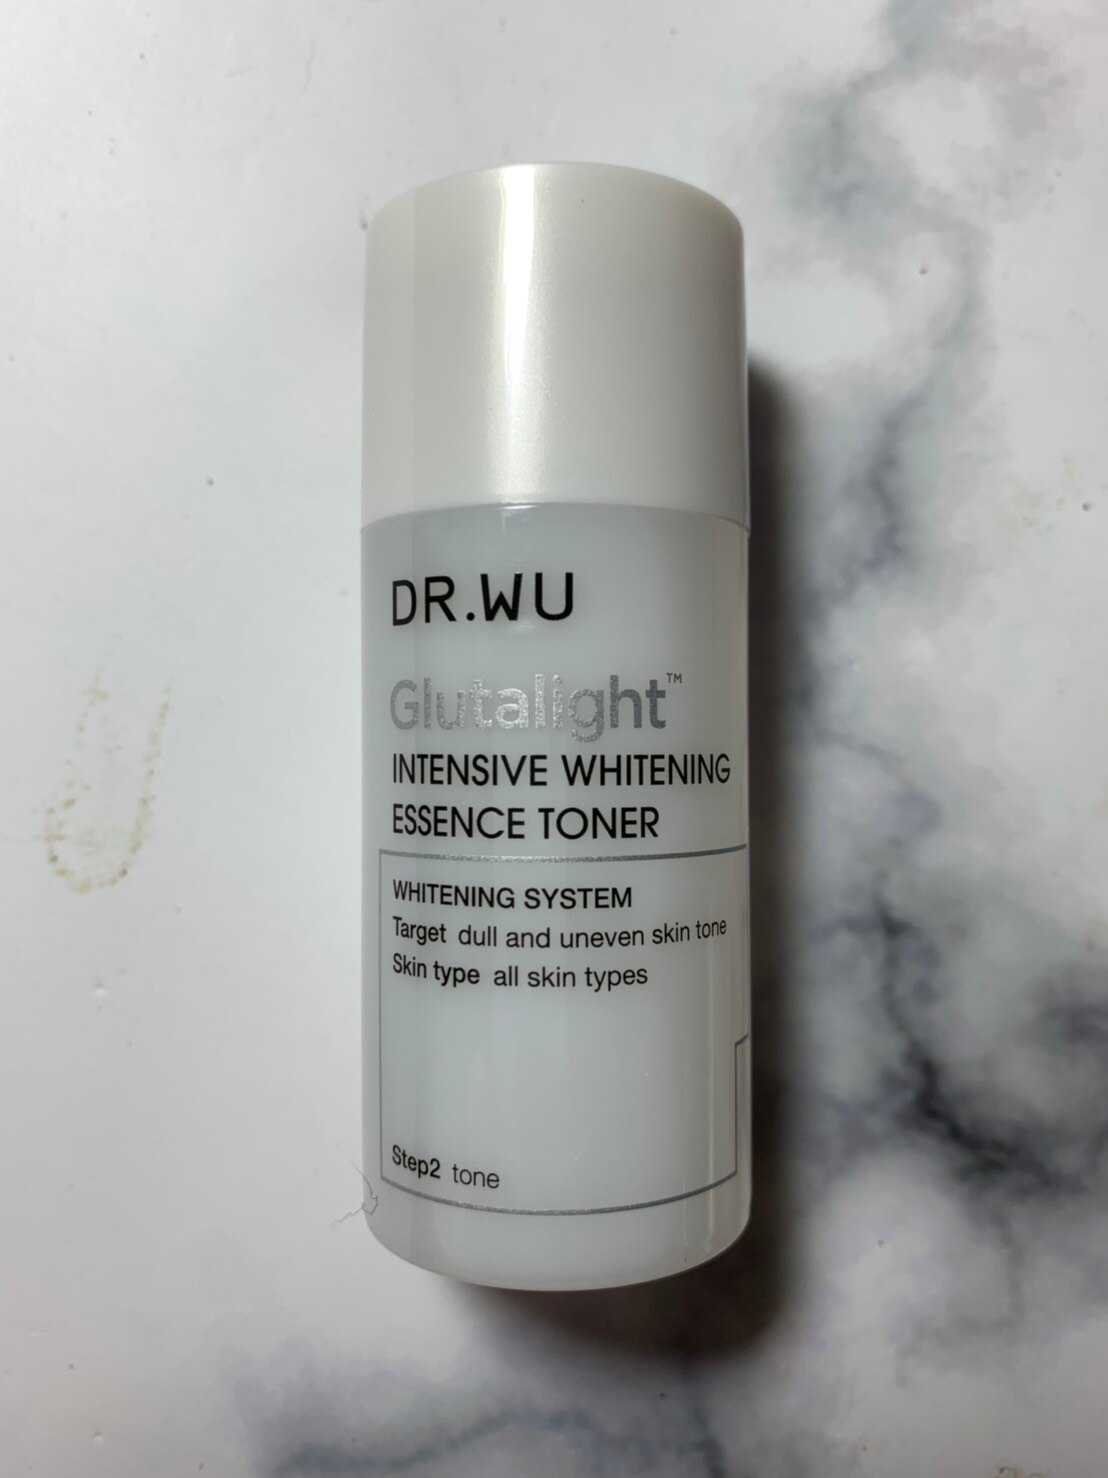 【DR. WU】 潤透光美白化妝水30ml 全新品  效期2021.11  【淨妍美肌】